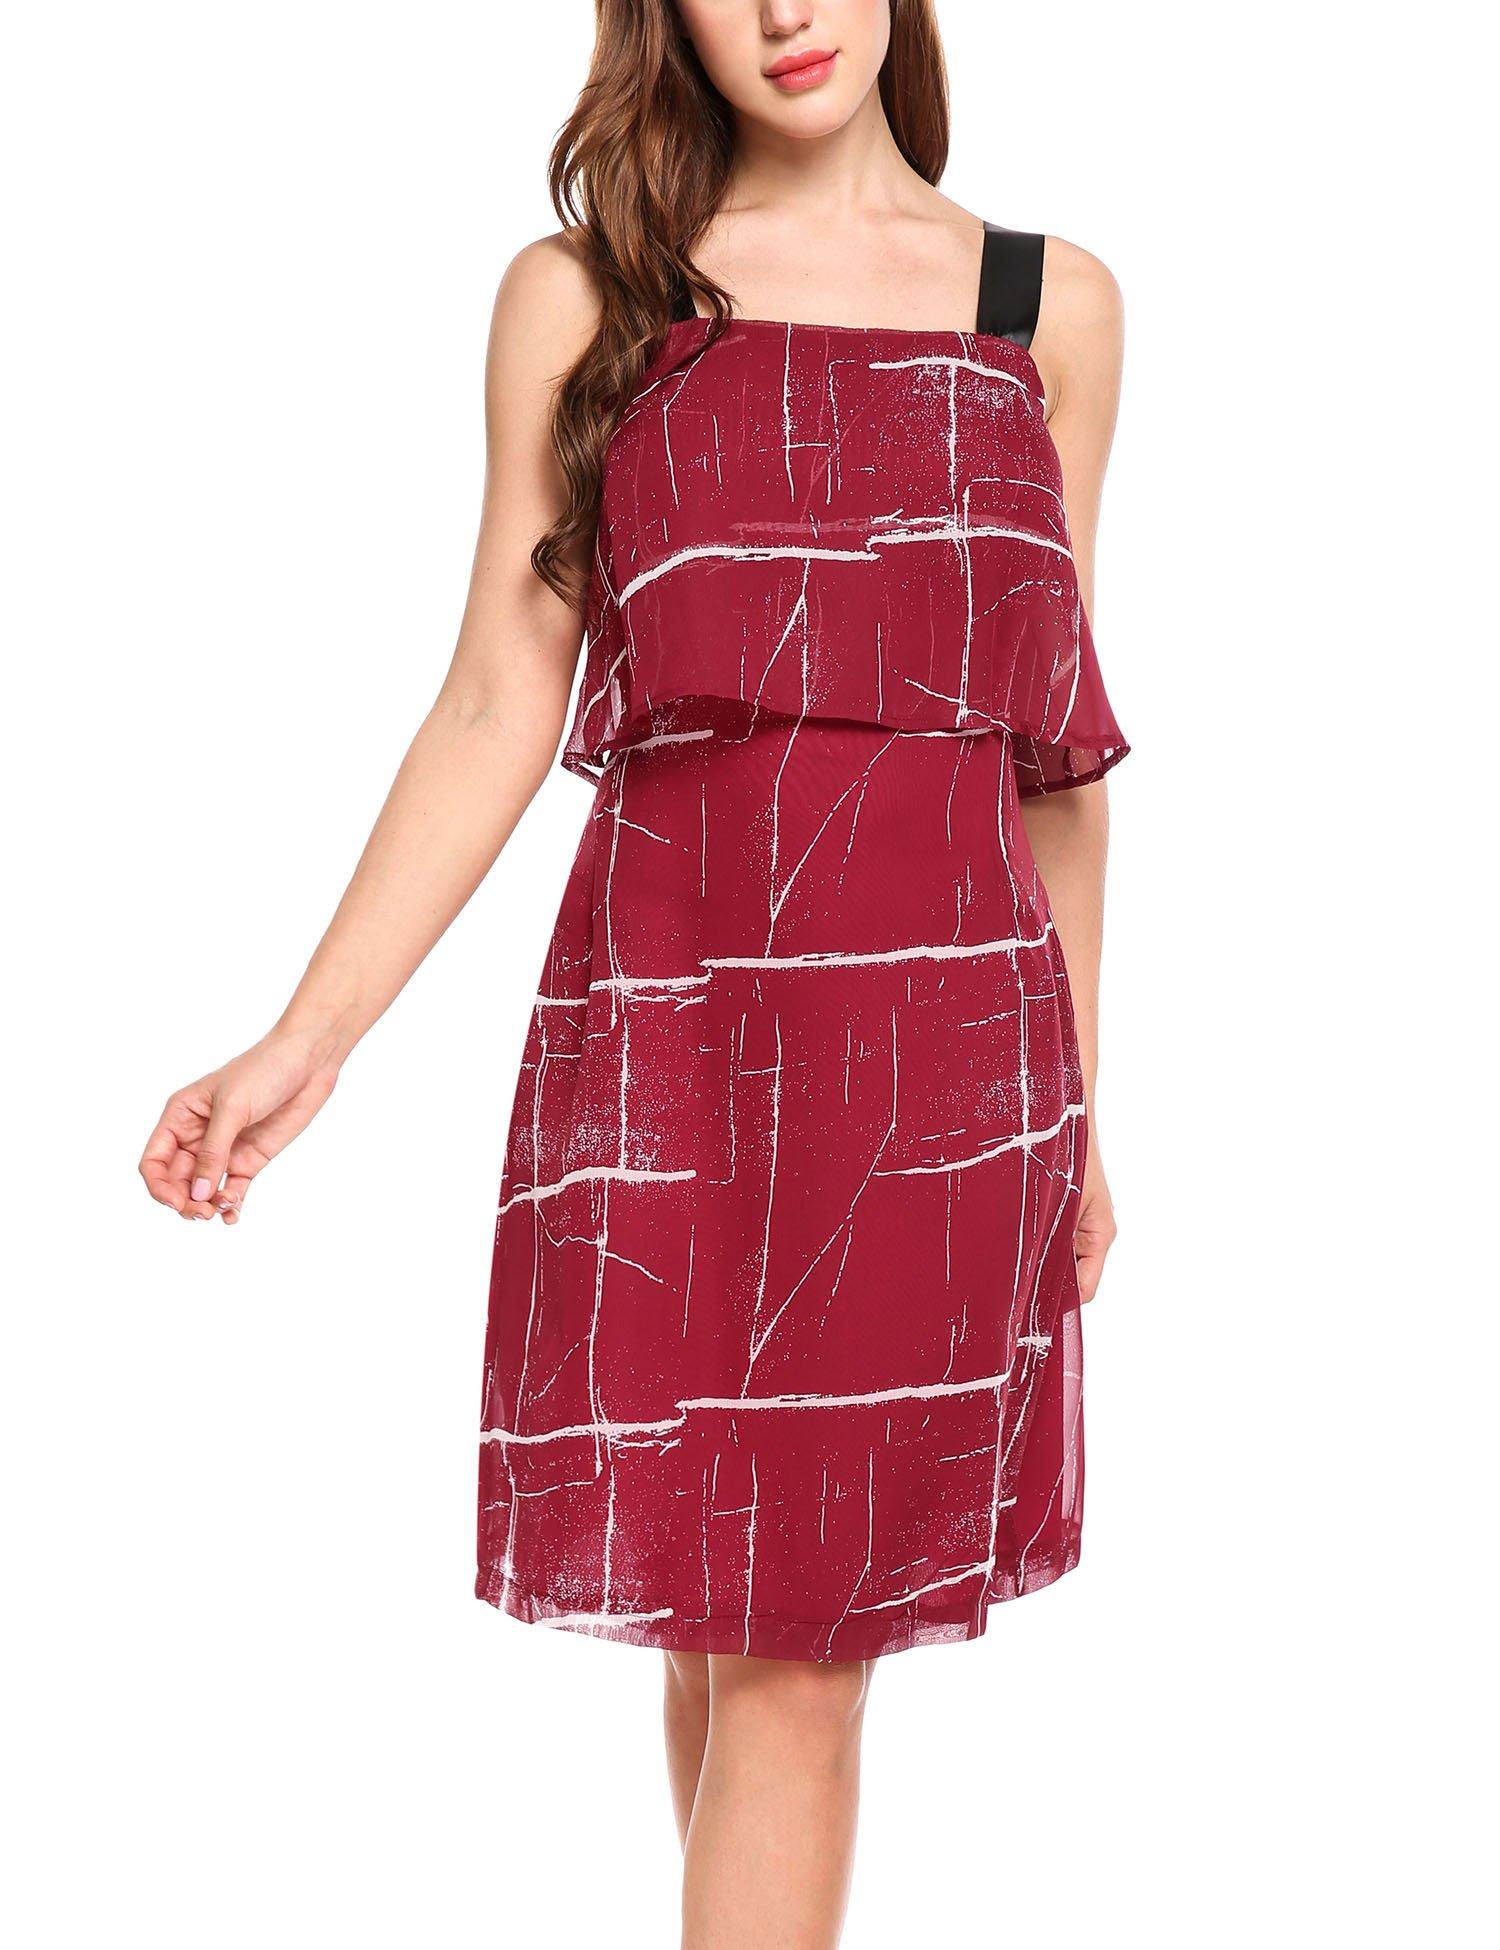 Zeagoo Women's Casual Chiffon Sleeveless Plaid Strap Tiered-Top Sun Dress